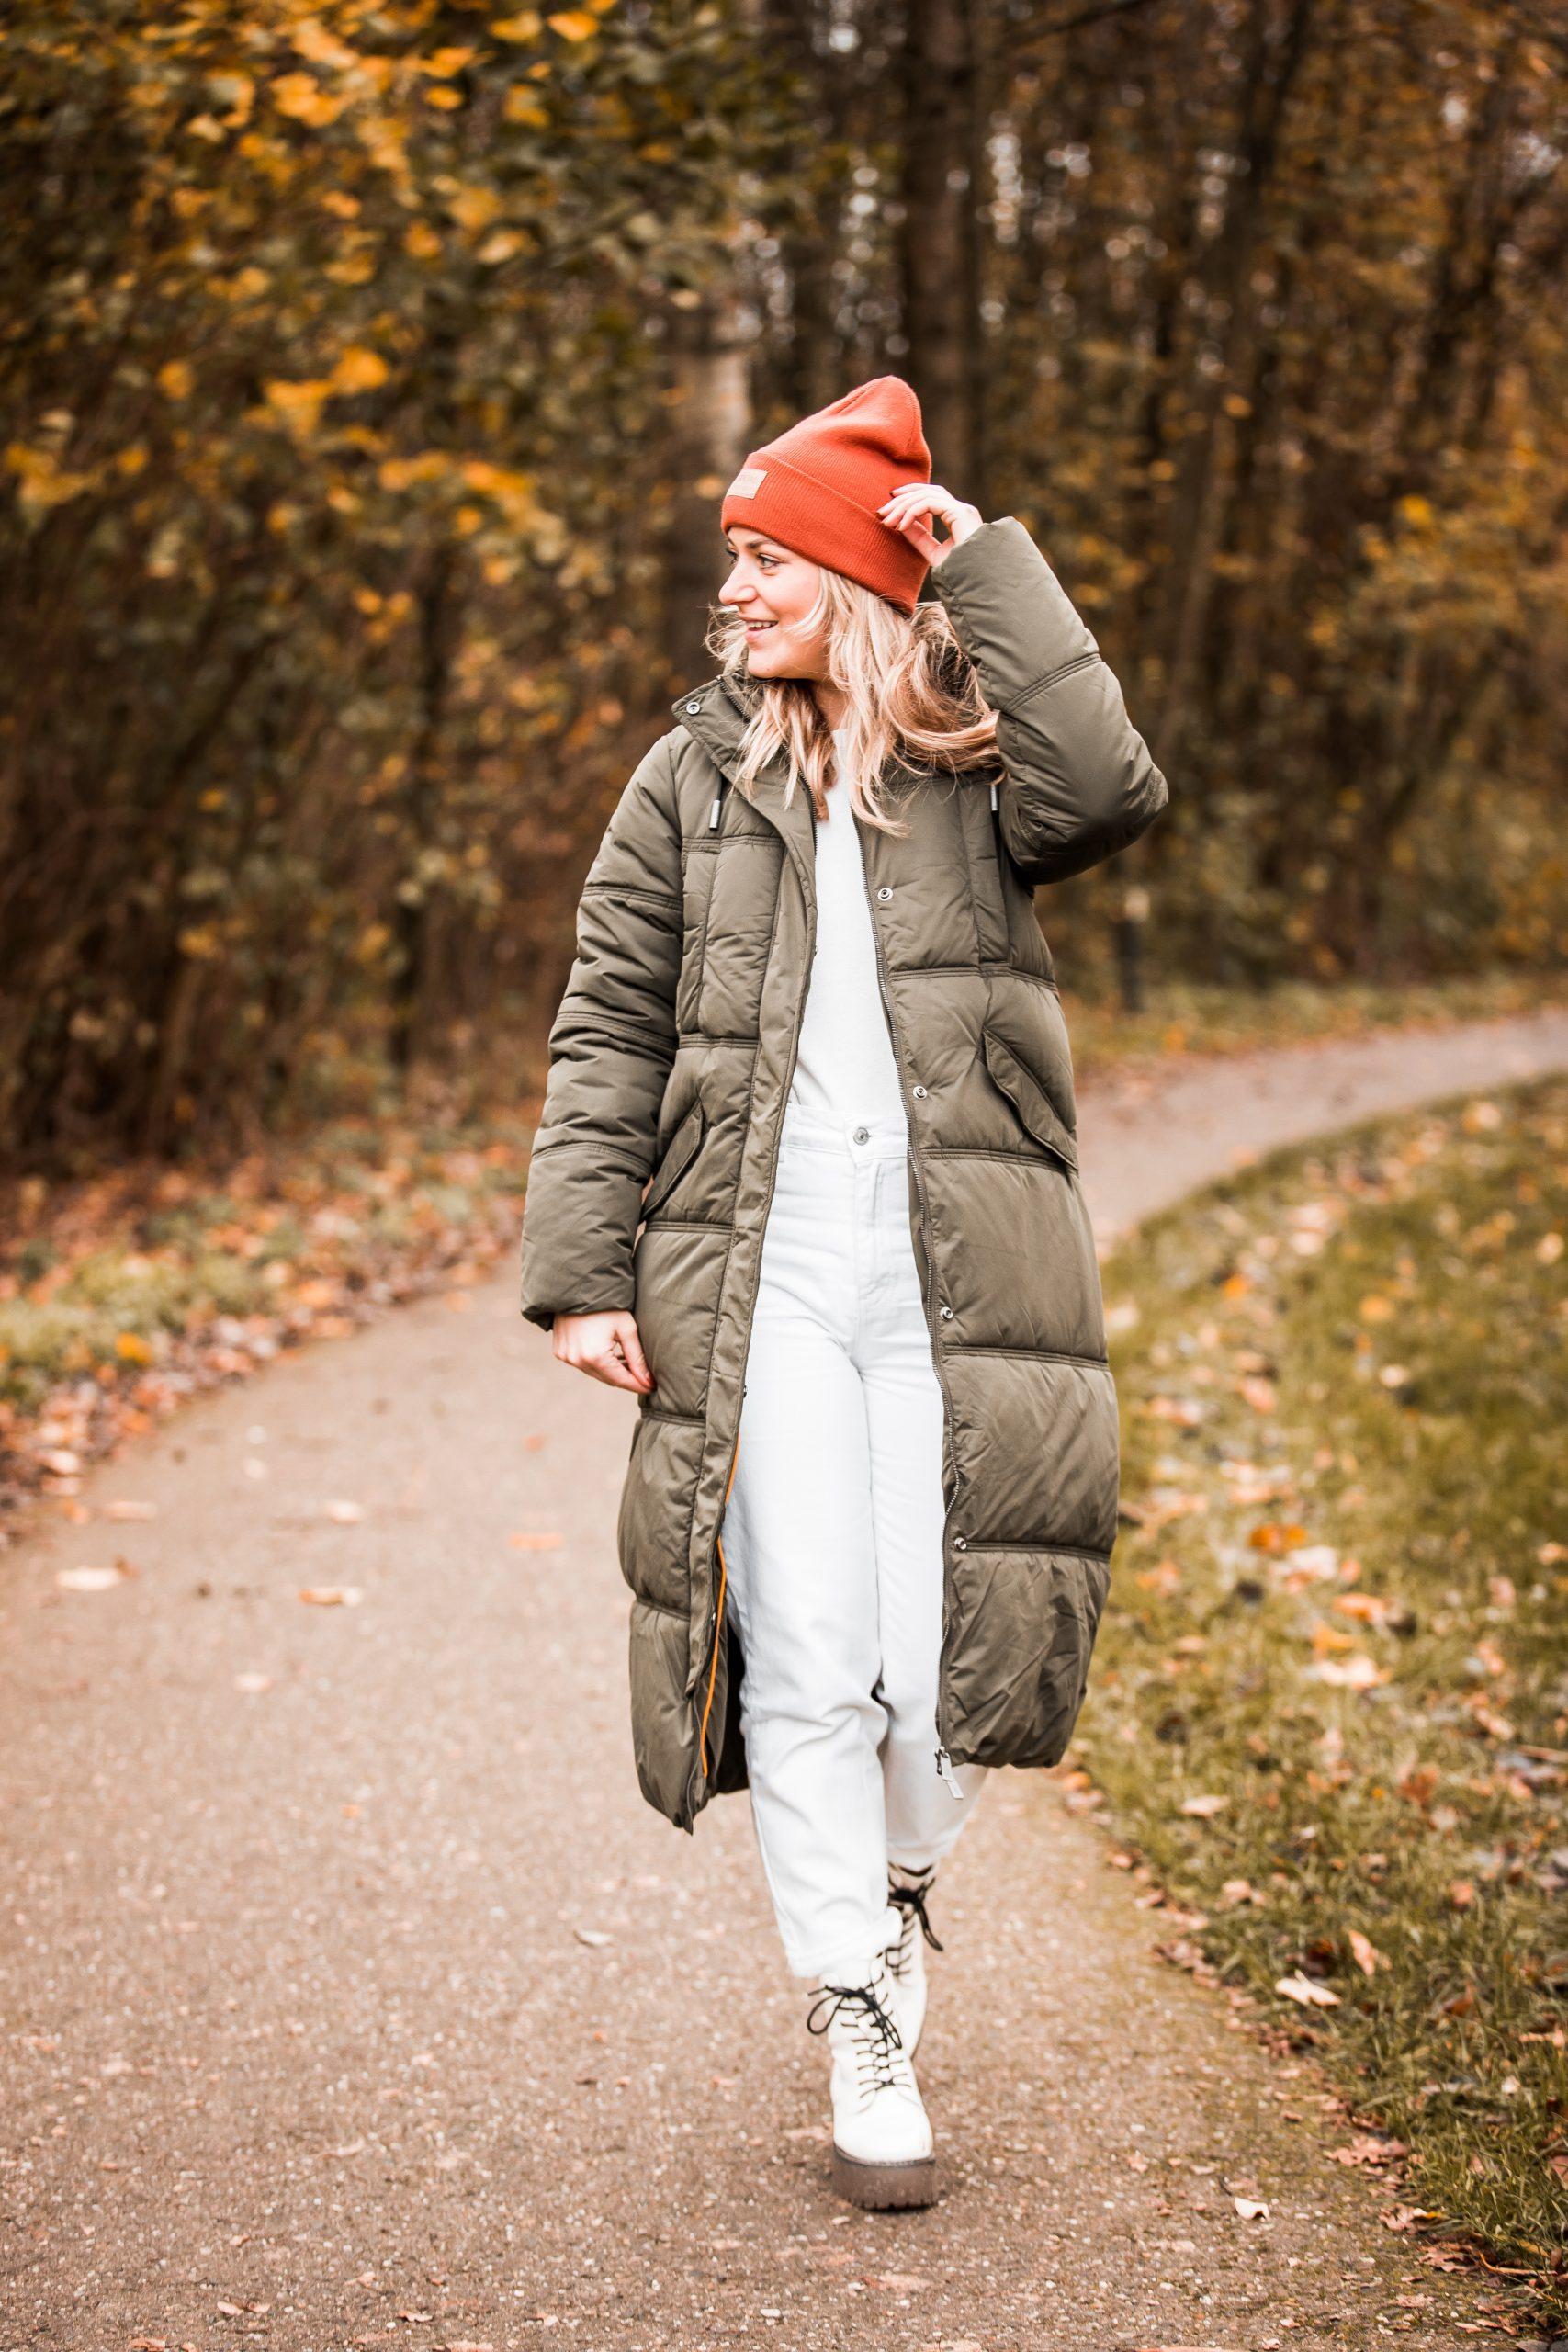 xtra-social, jas, winterjas, plutosport, superdry, dikke jas, warme jas, lange jas, mannen jas, dames jas, winter, herfst